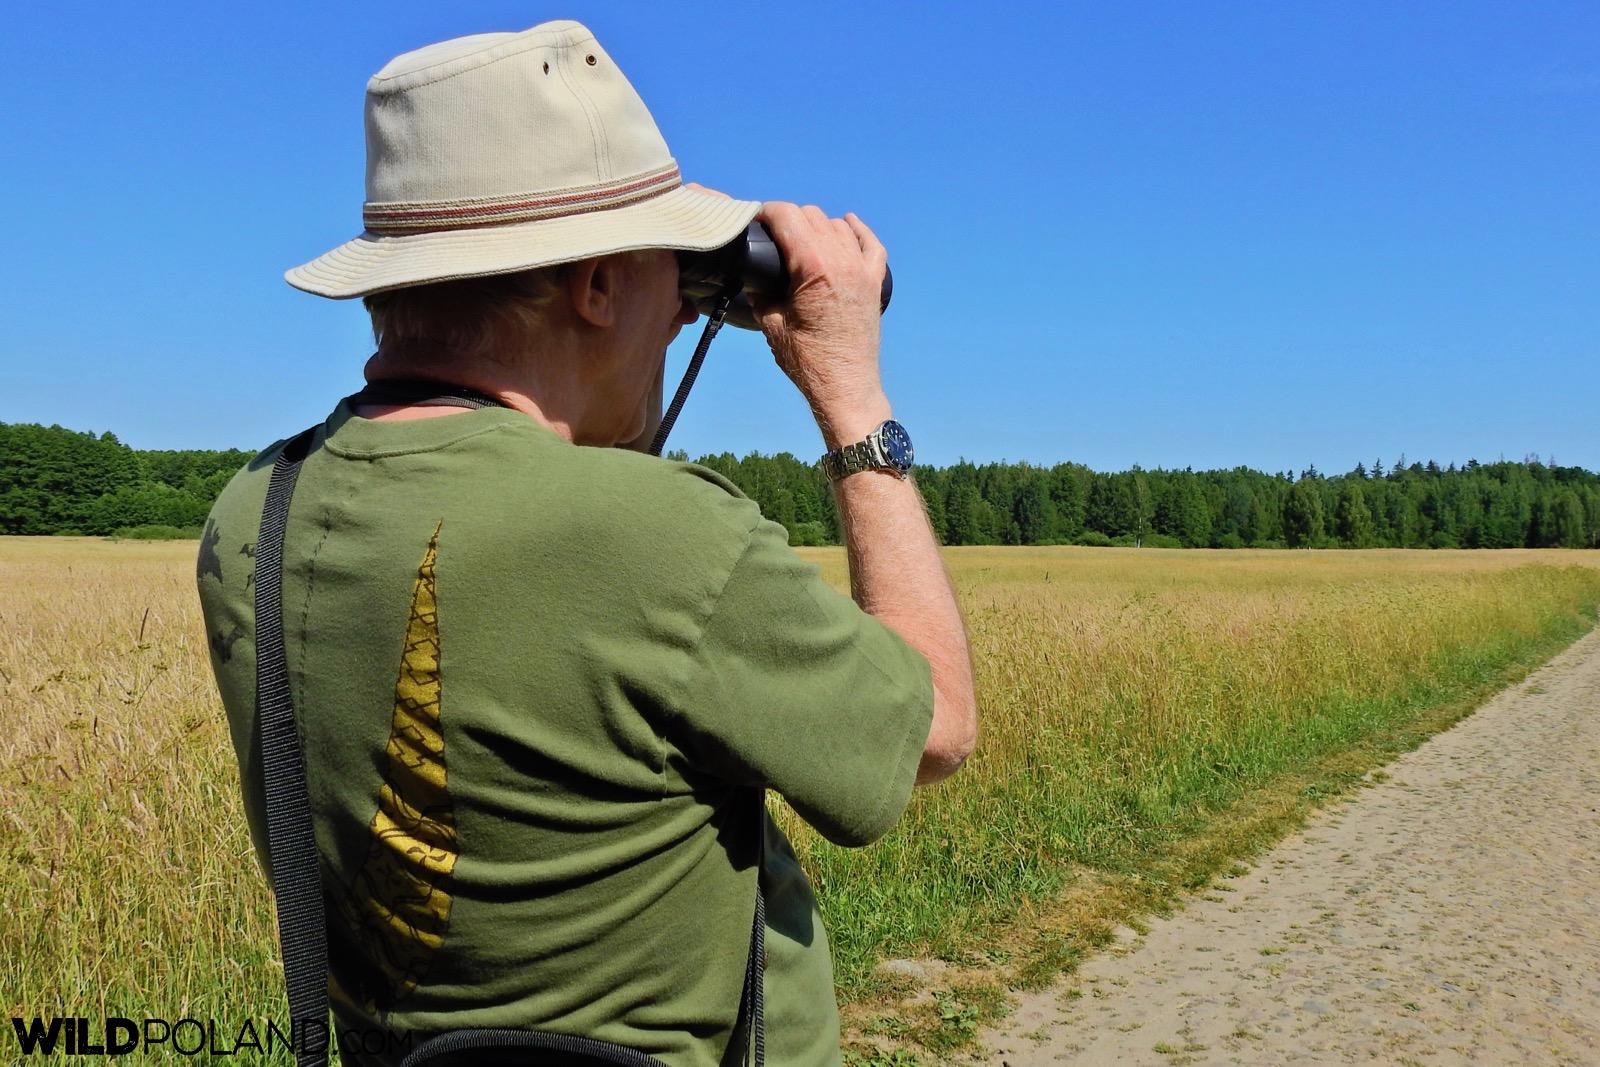 binoculars always at hand